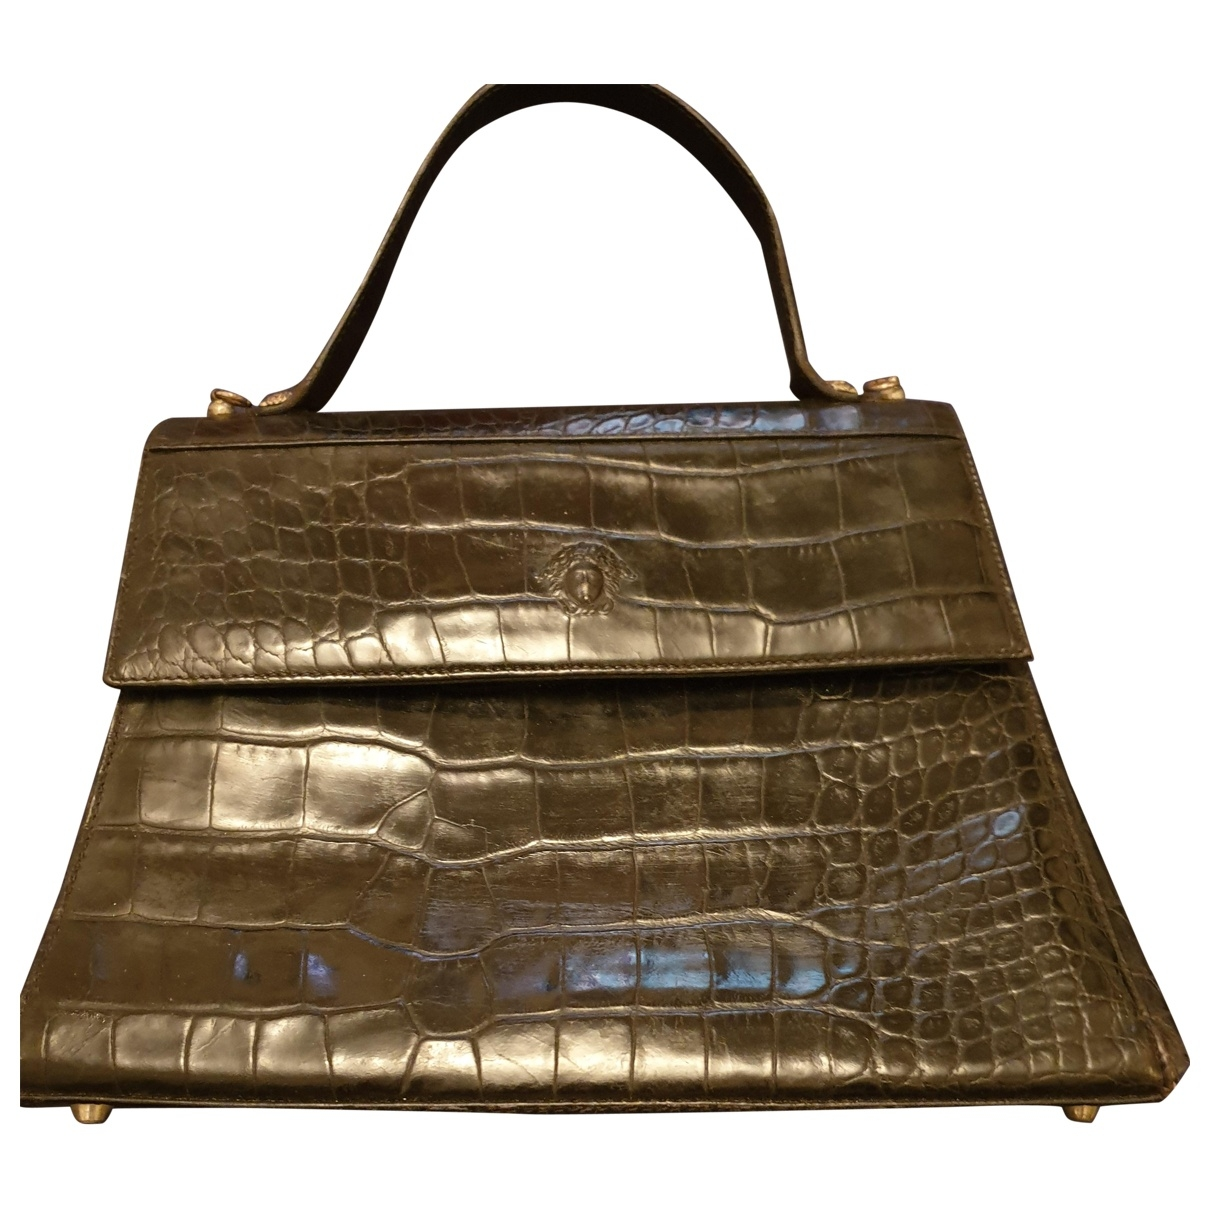 Gianni Versace \N Handtasche in  Schwarz Exotenleder